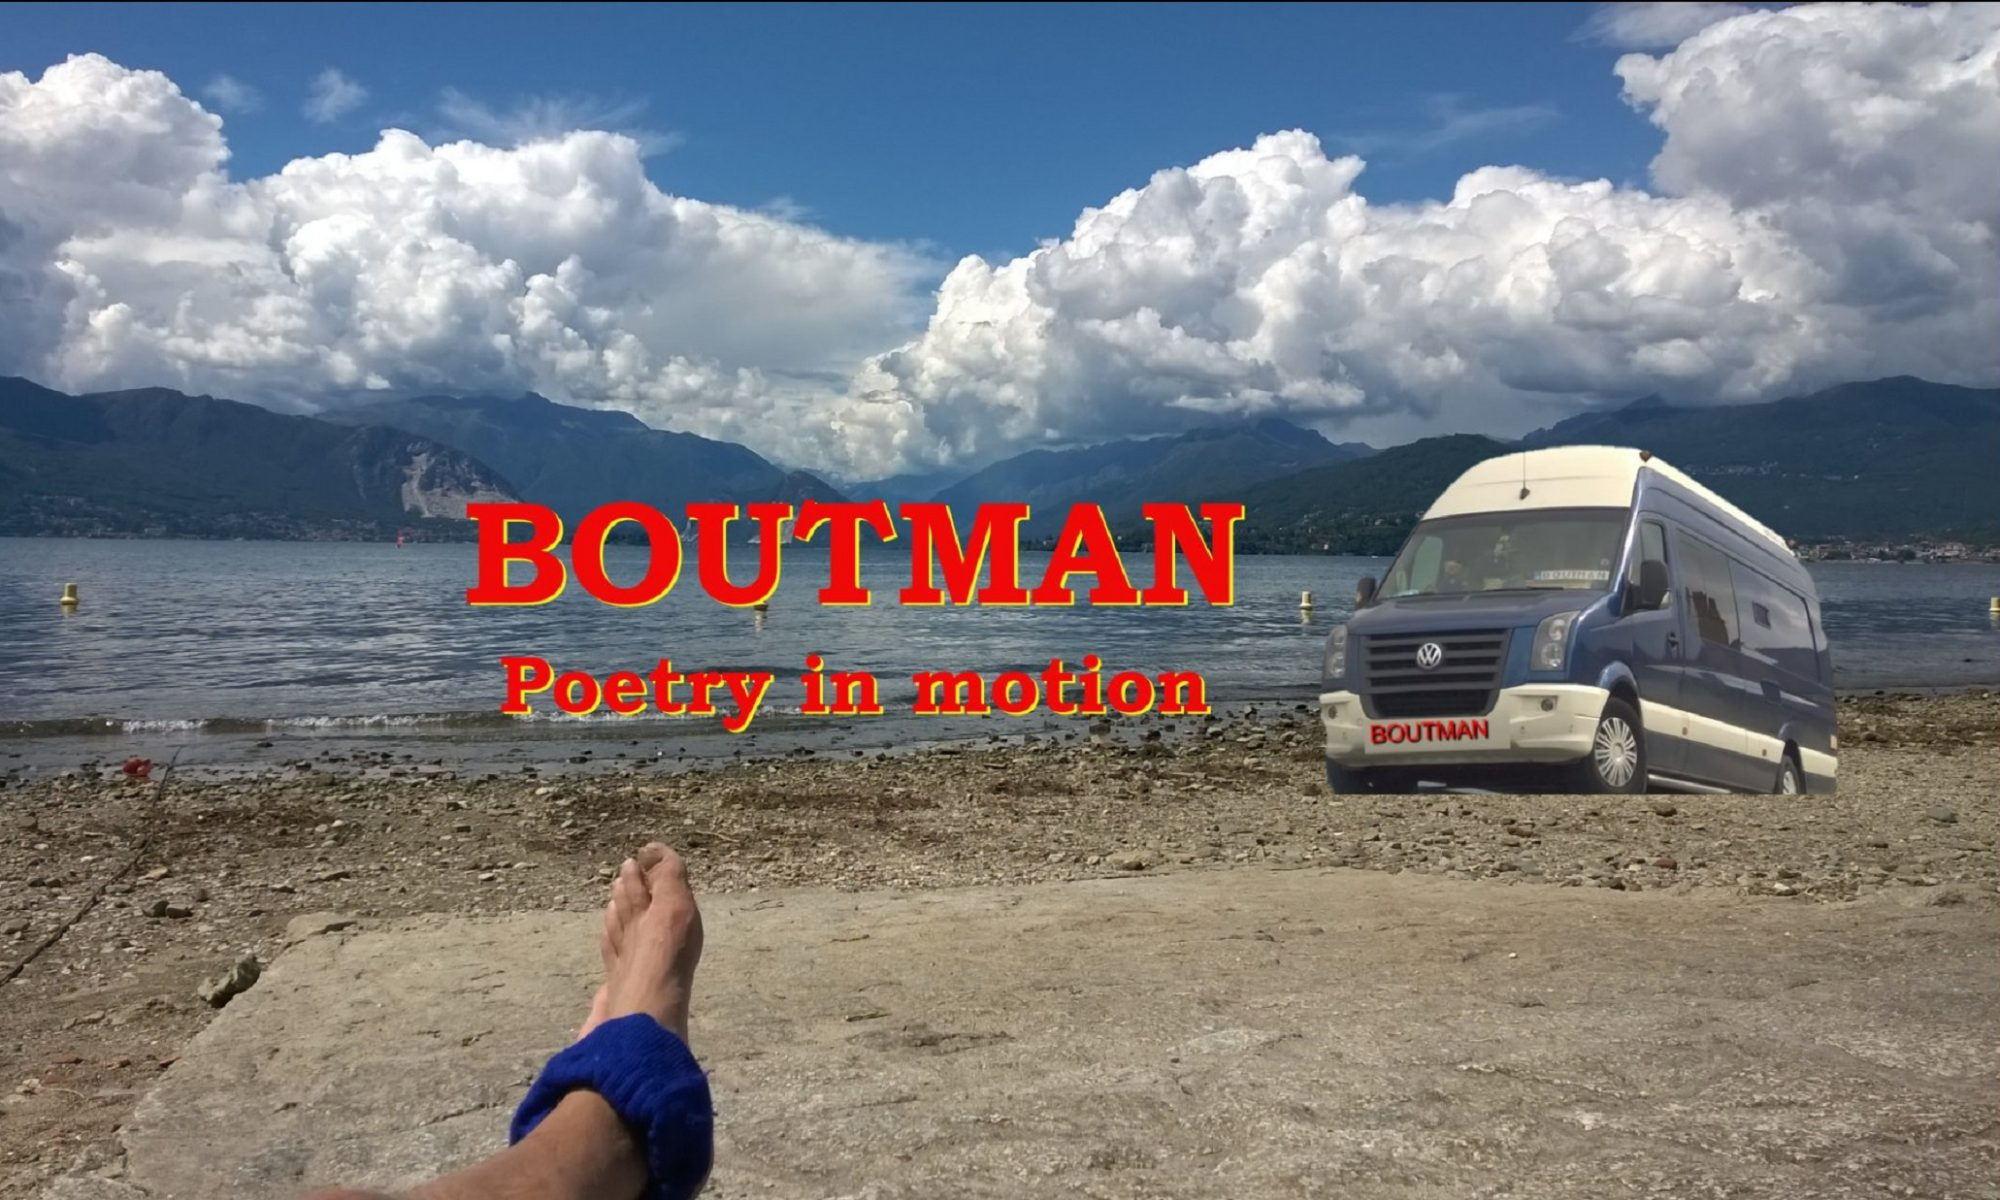 Boutman